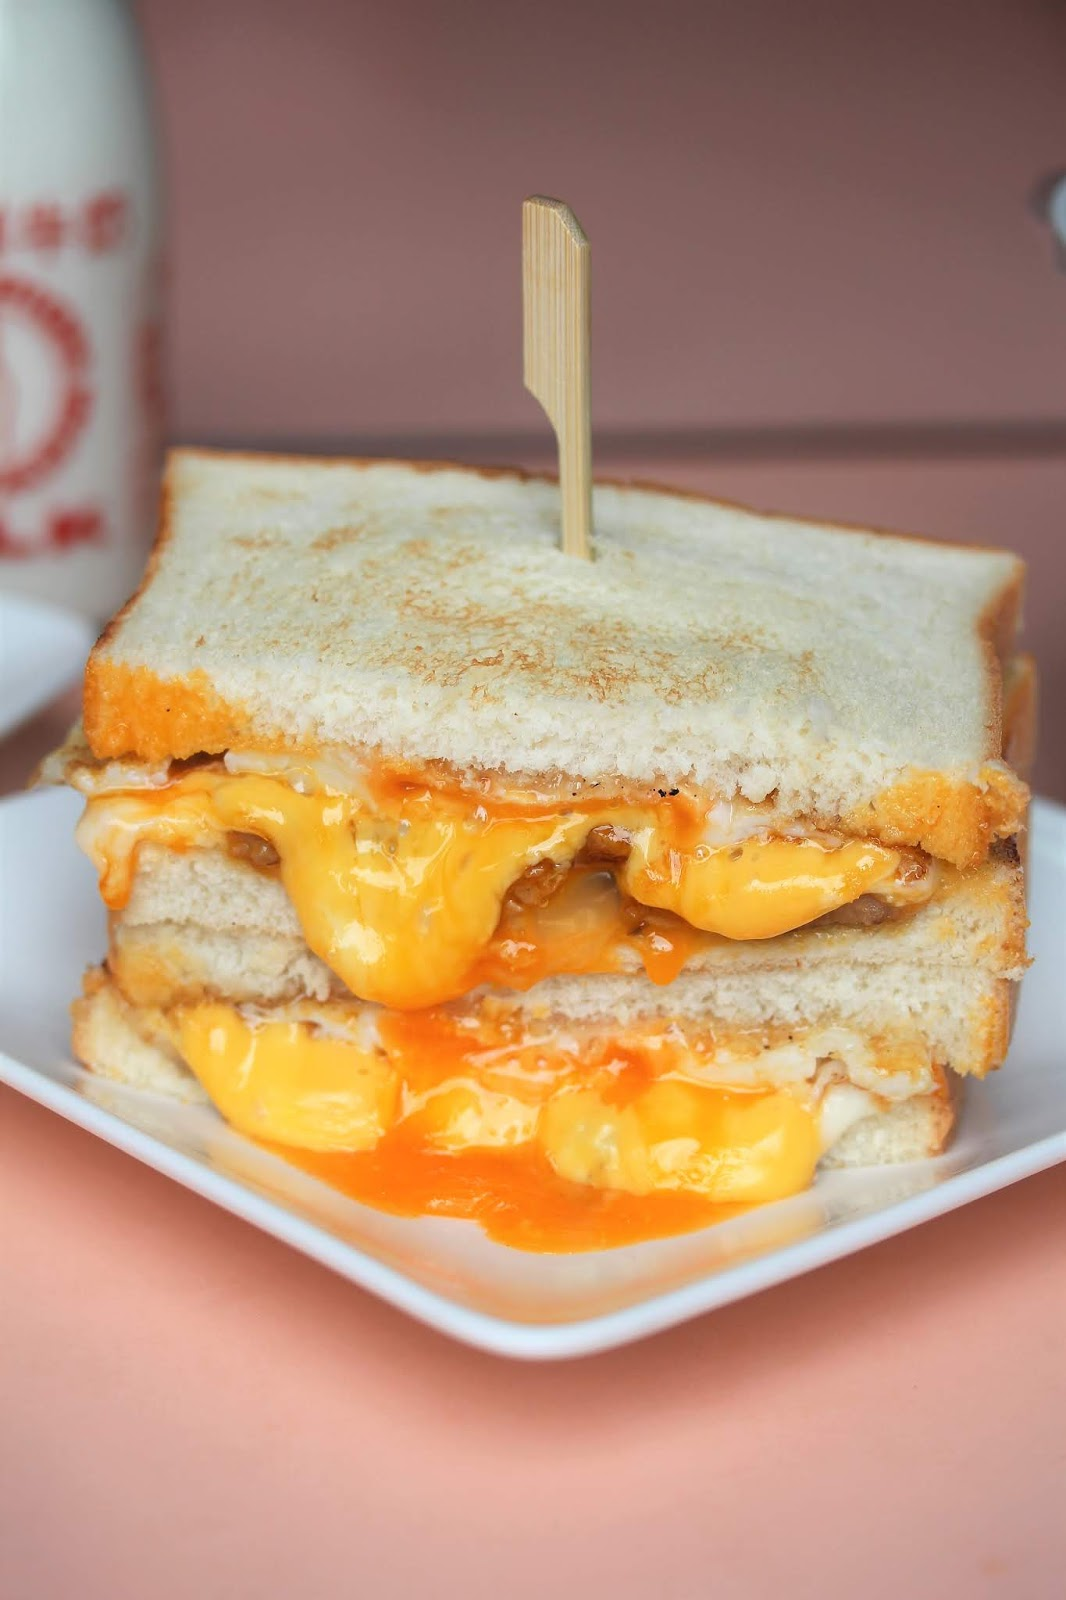 Singapore Japan Food Blog : Dairy and Cream: 【臺北中山】可蜜達Comida 炭烤吐司